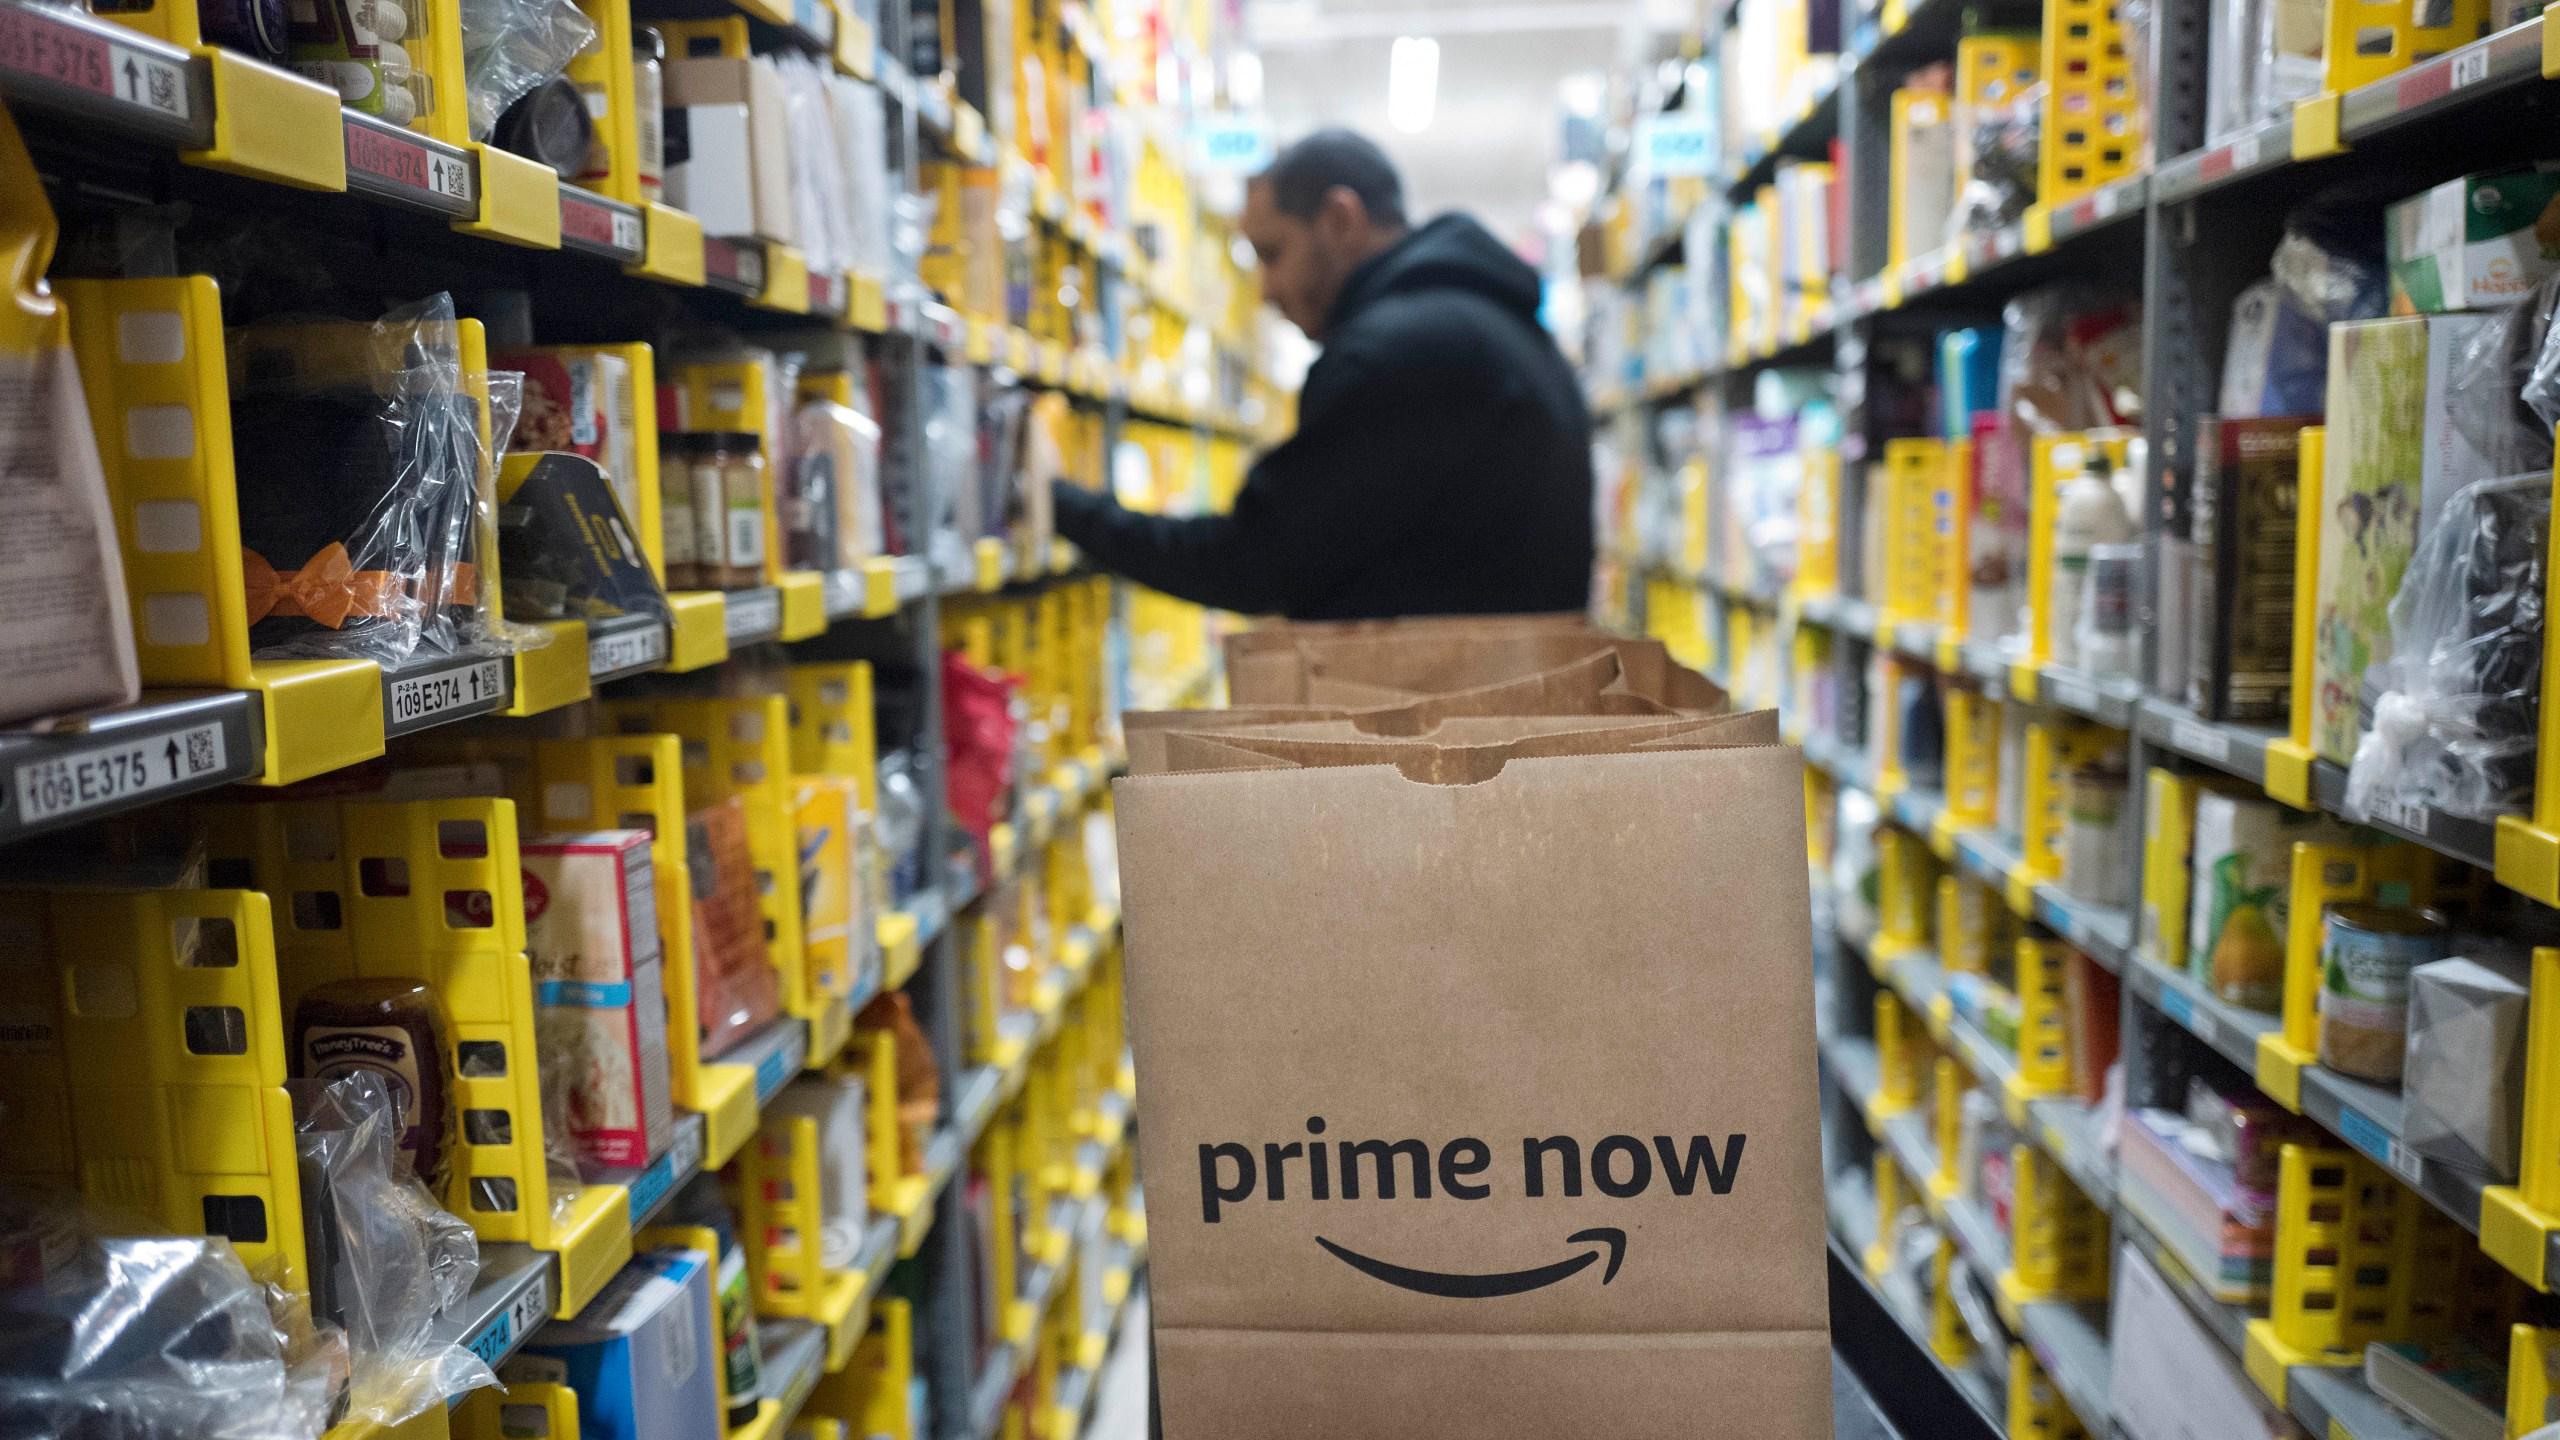 Amazon-Prime_Price_Hike_81729-159532.jpg02795244